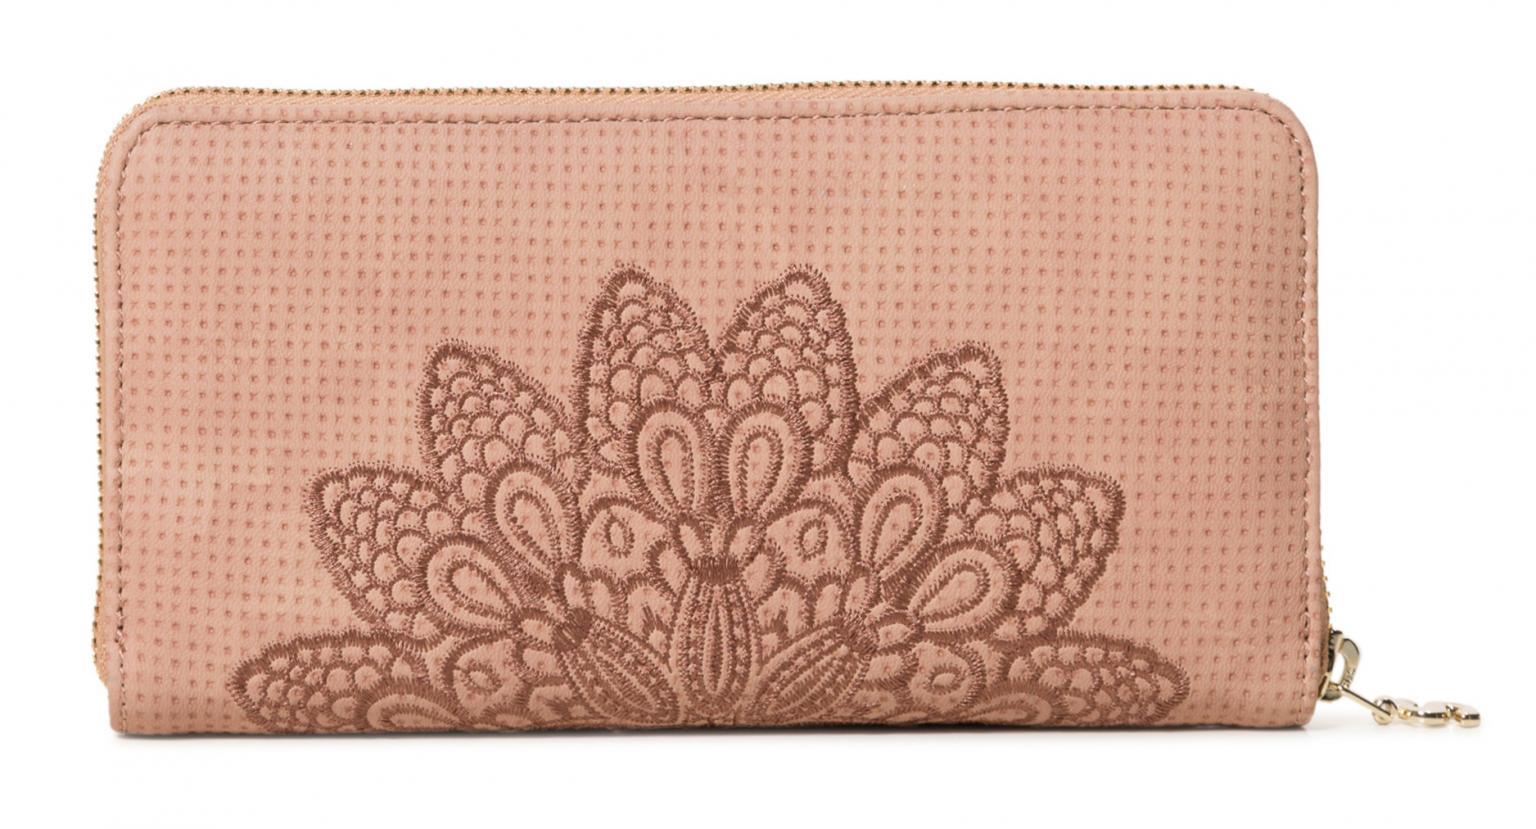 Desigual Geldbörse Fiona Atila bestickt rosa Mandala